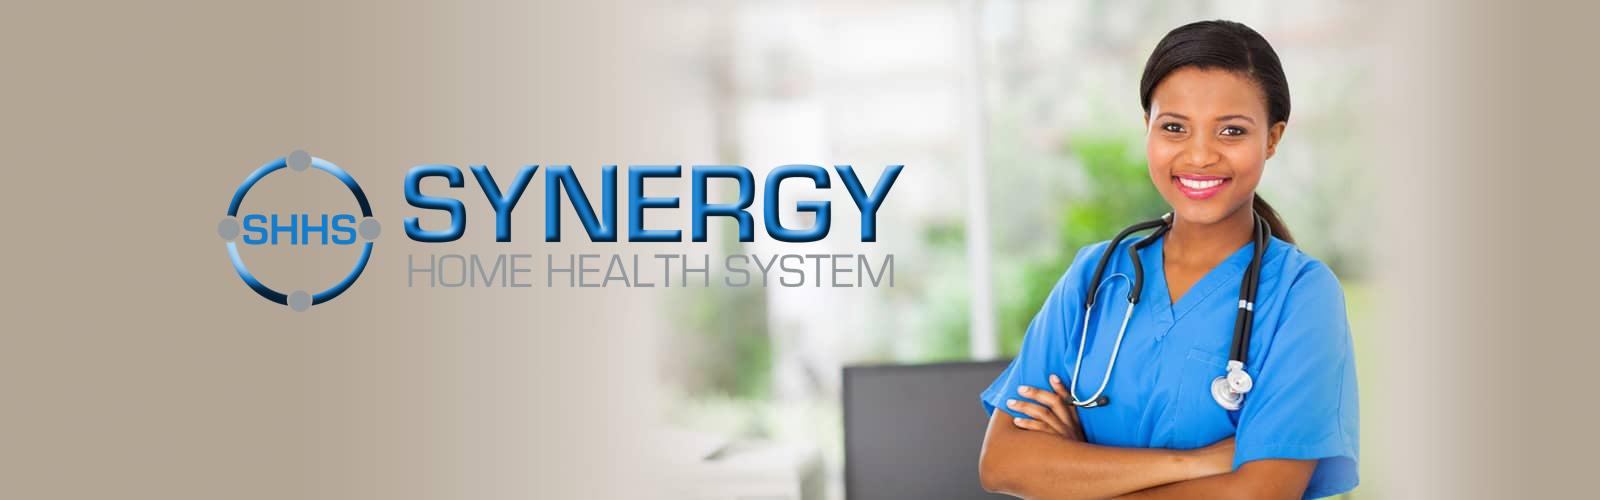 SYNERGY HOME HEALTH SYSTEM